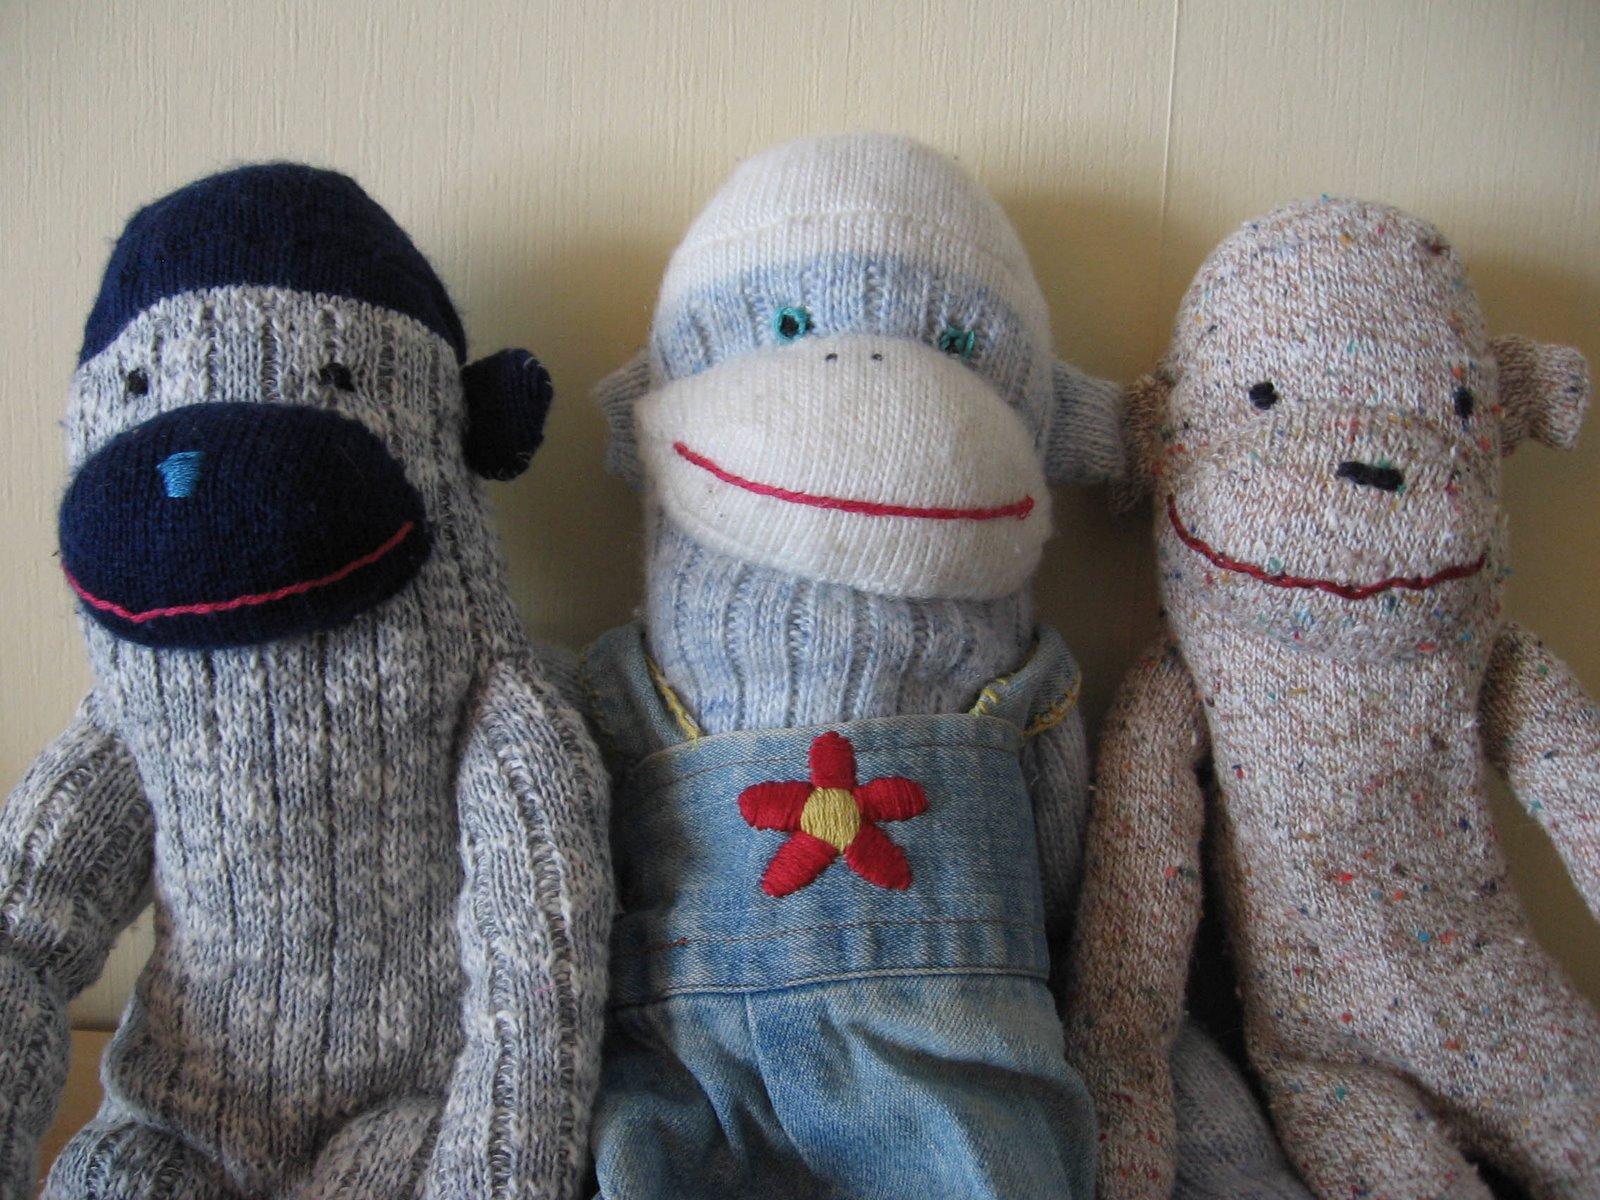 [monkeys]